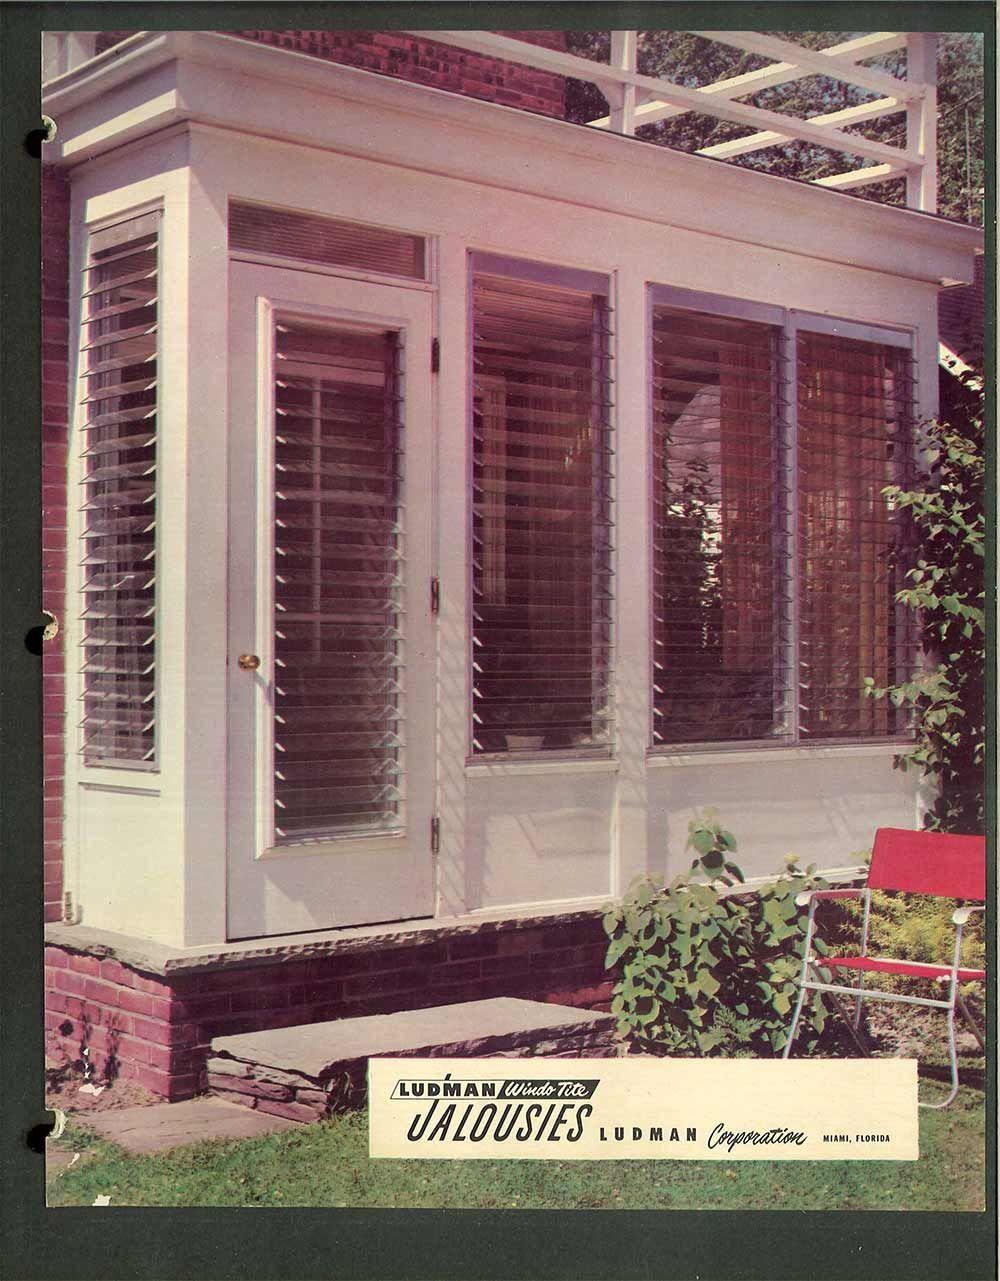 Jalousie Windows Their History And Where To Buy Them Today 21 Photos From 1950 Jalousie Window Louvre Windows Sunroom Windows